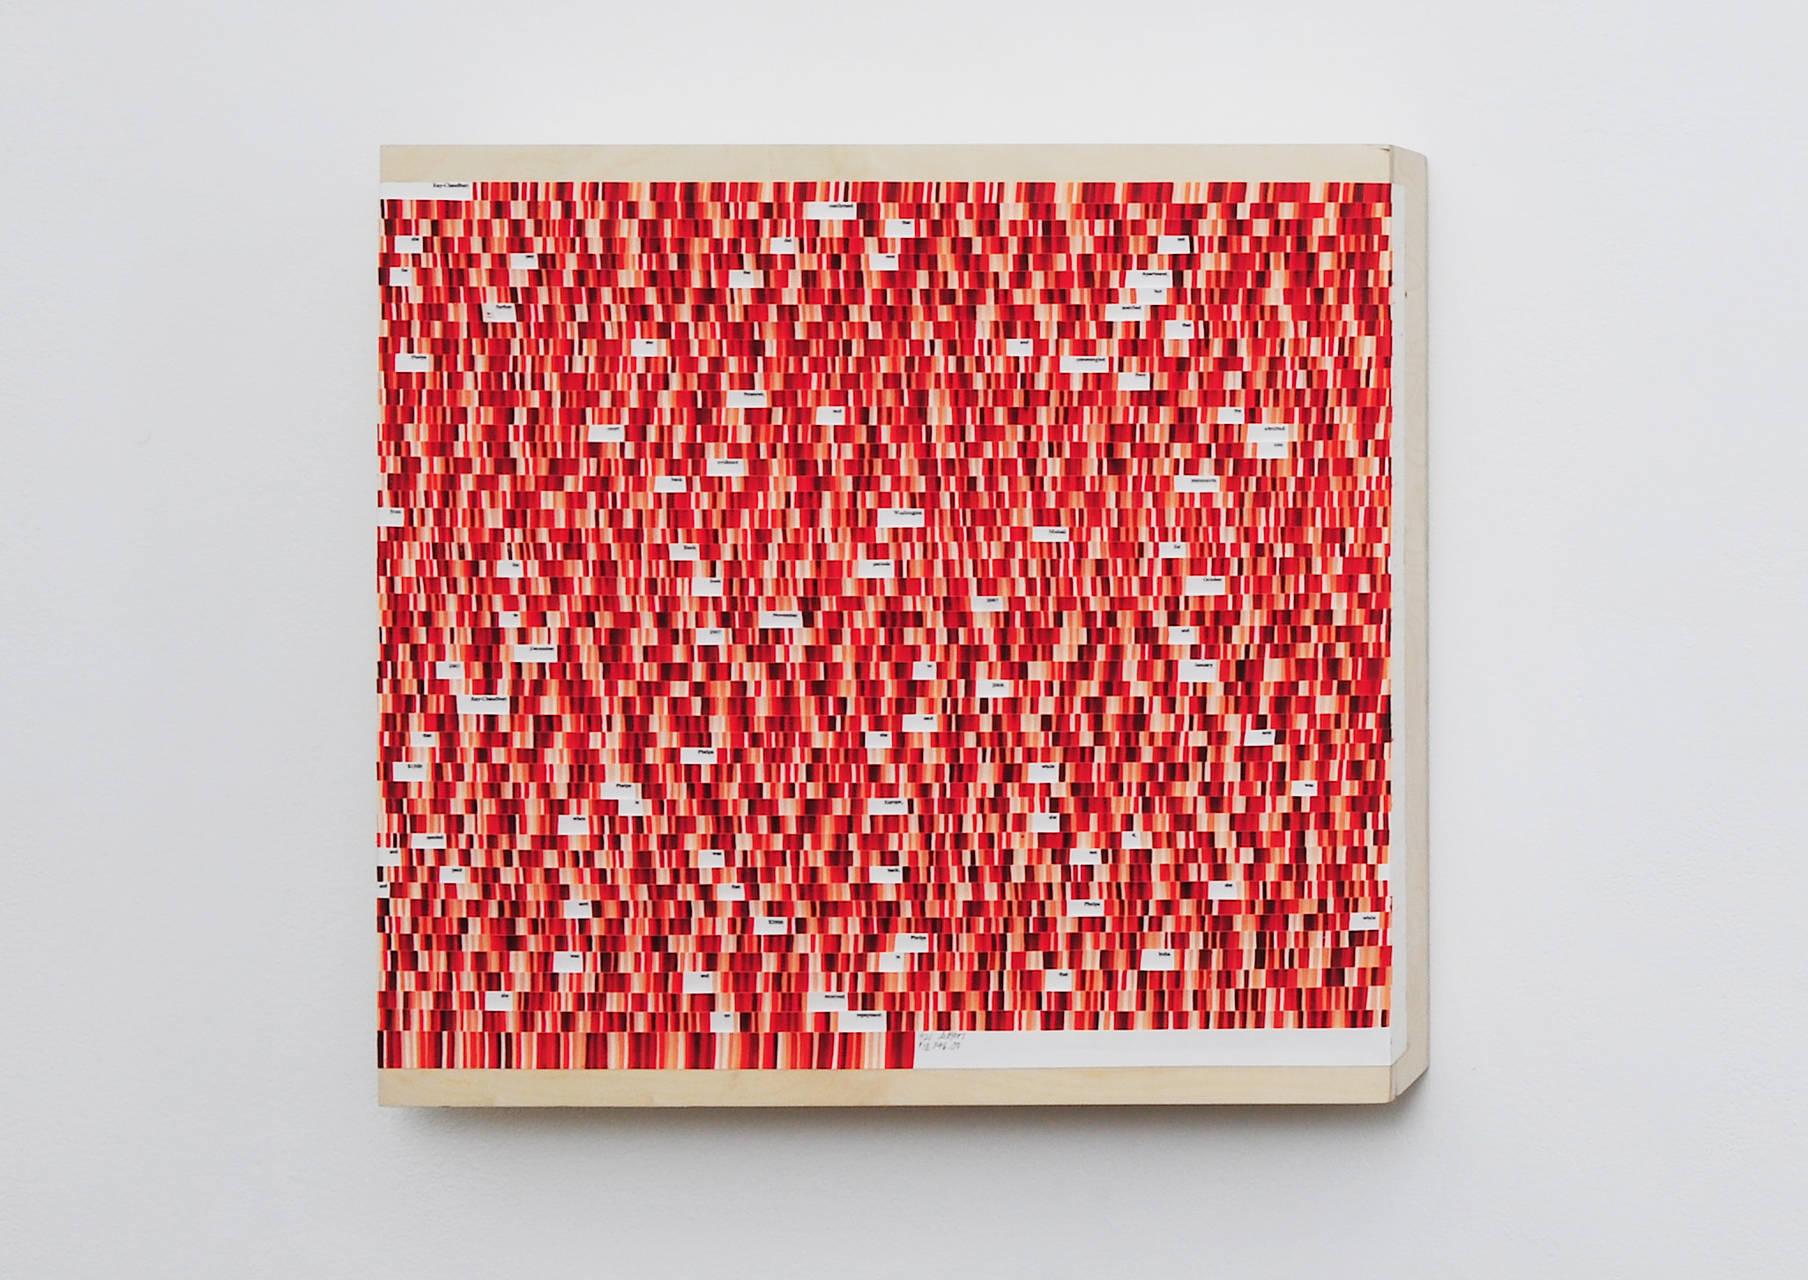 3 Danica Phelps, Cost of Love, 2011